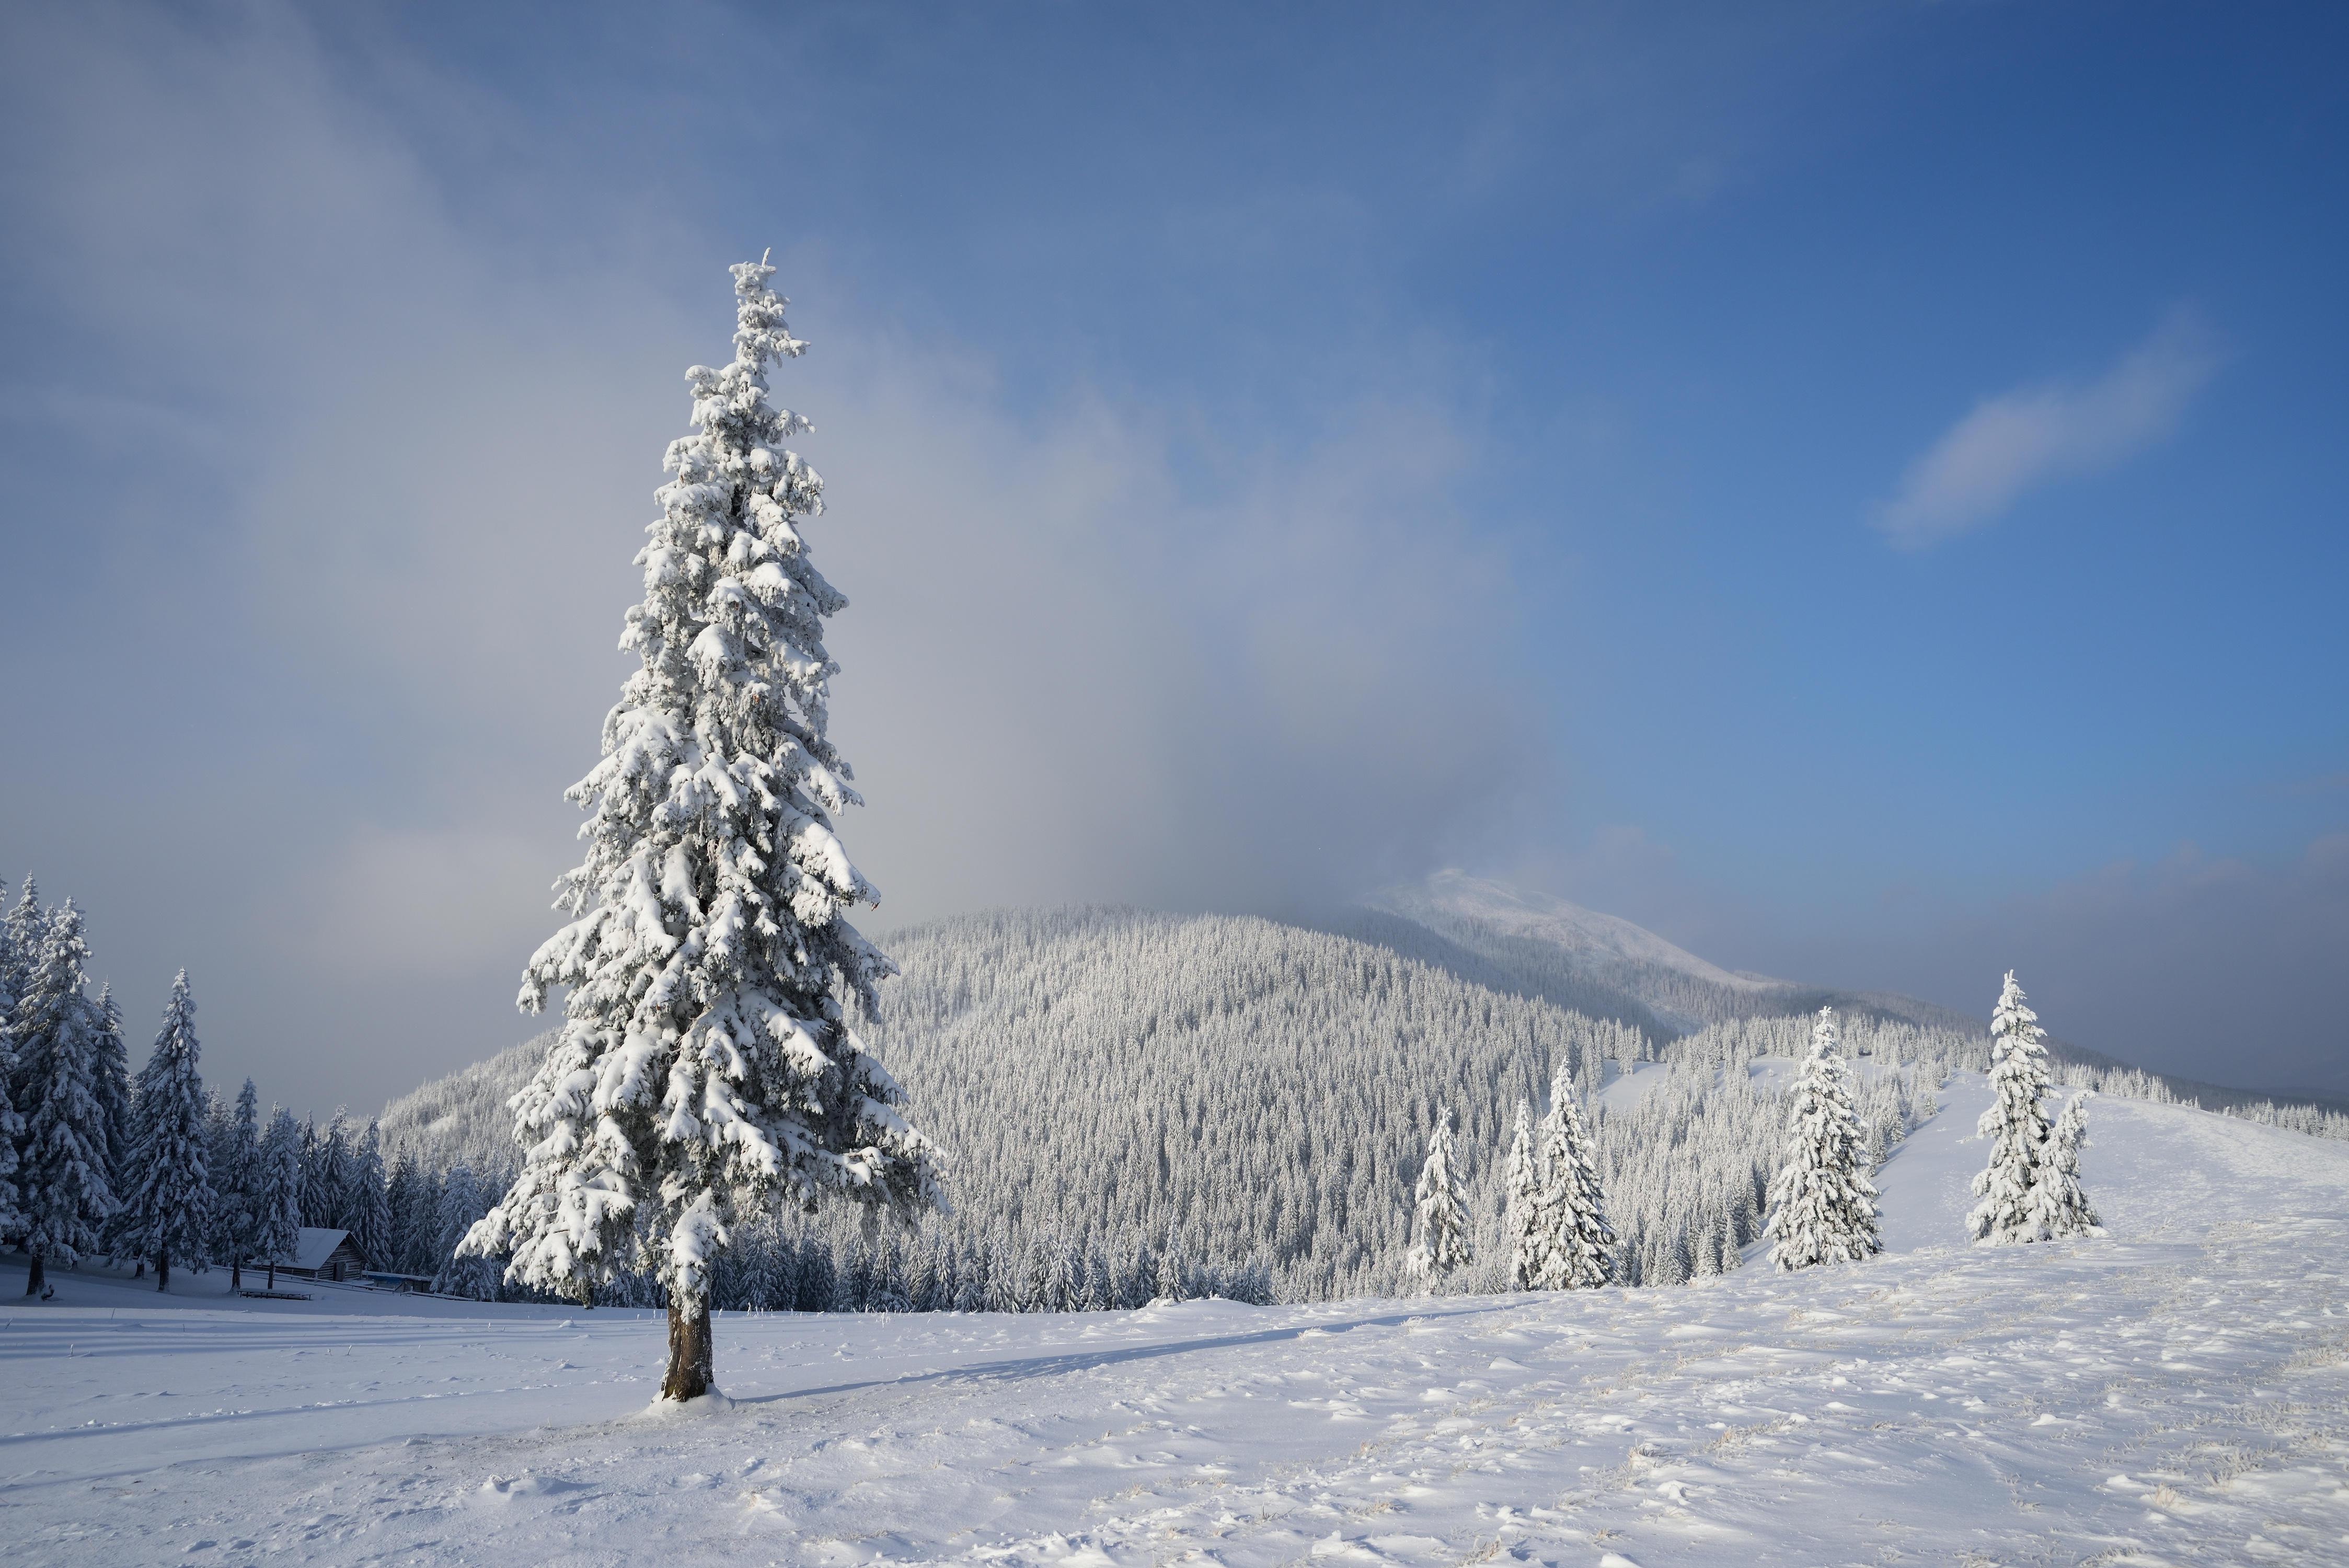 ели горы снег зима ate mountains snow winter без смс